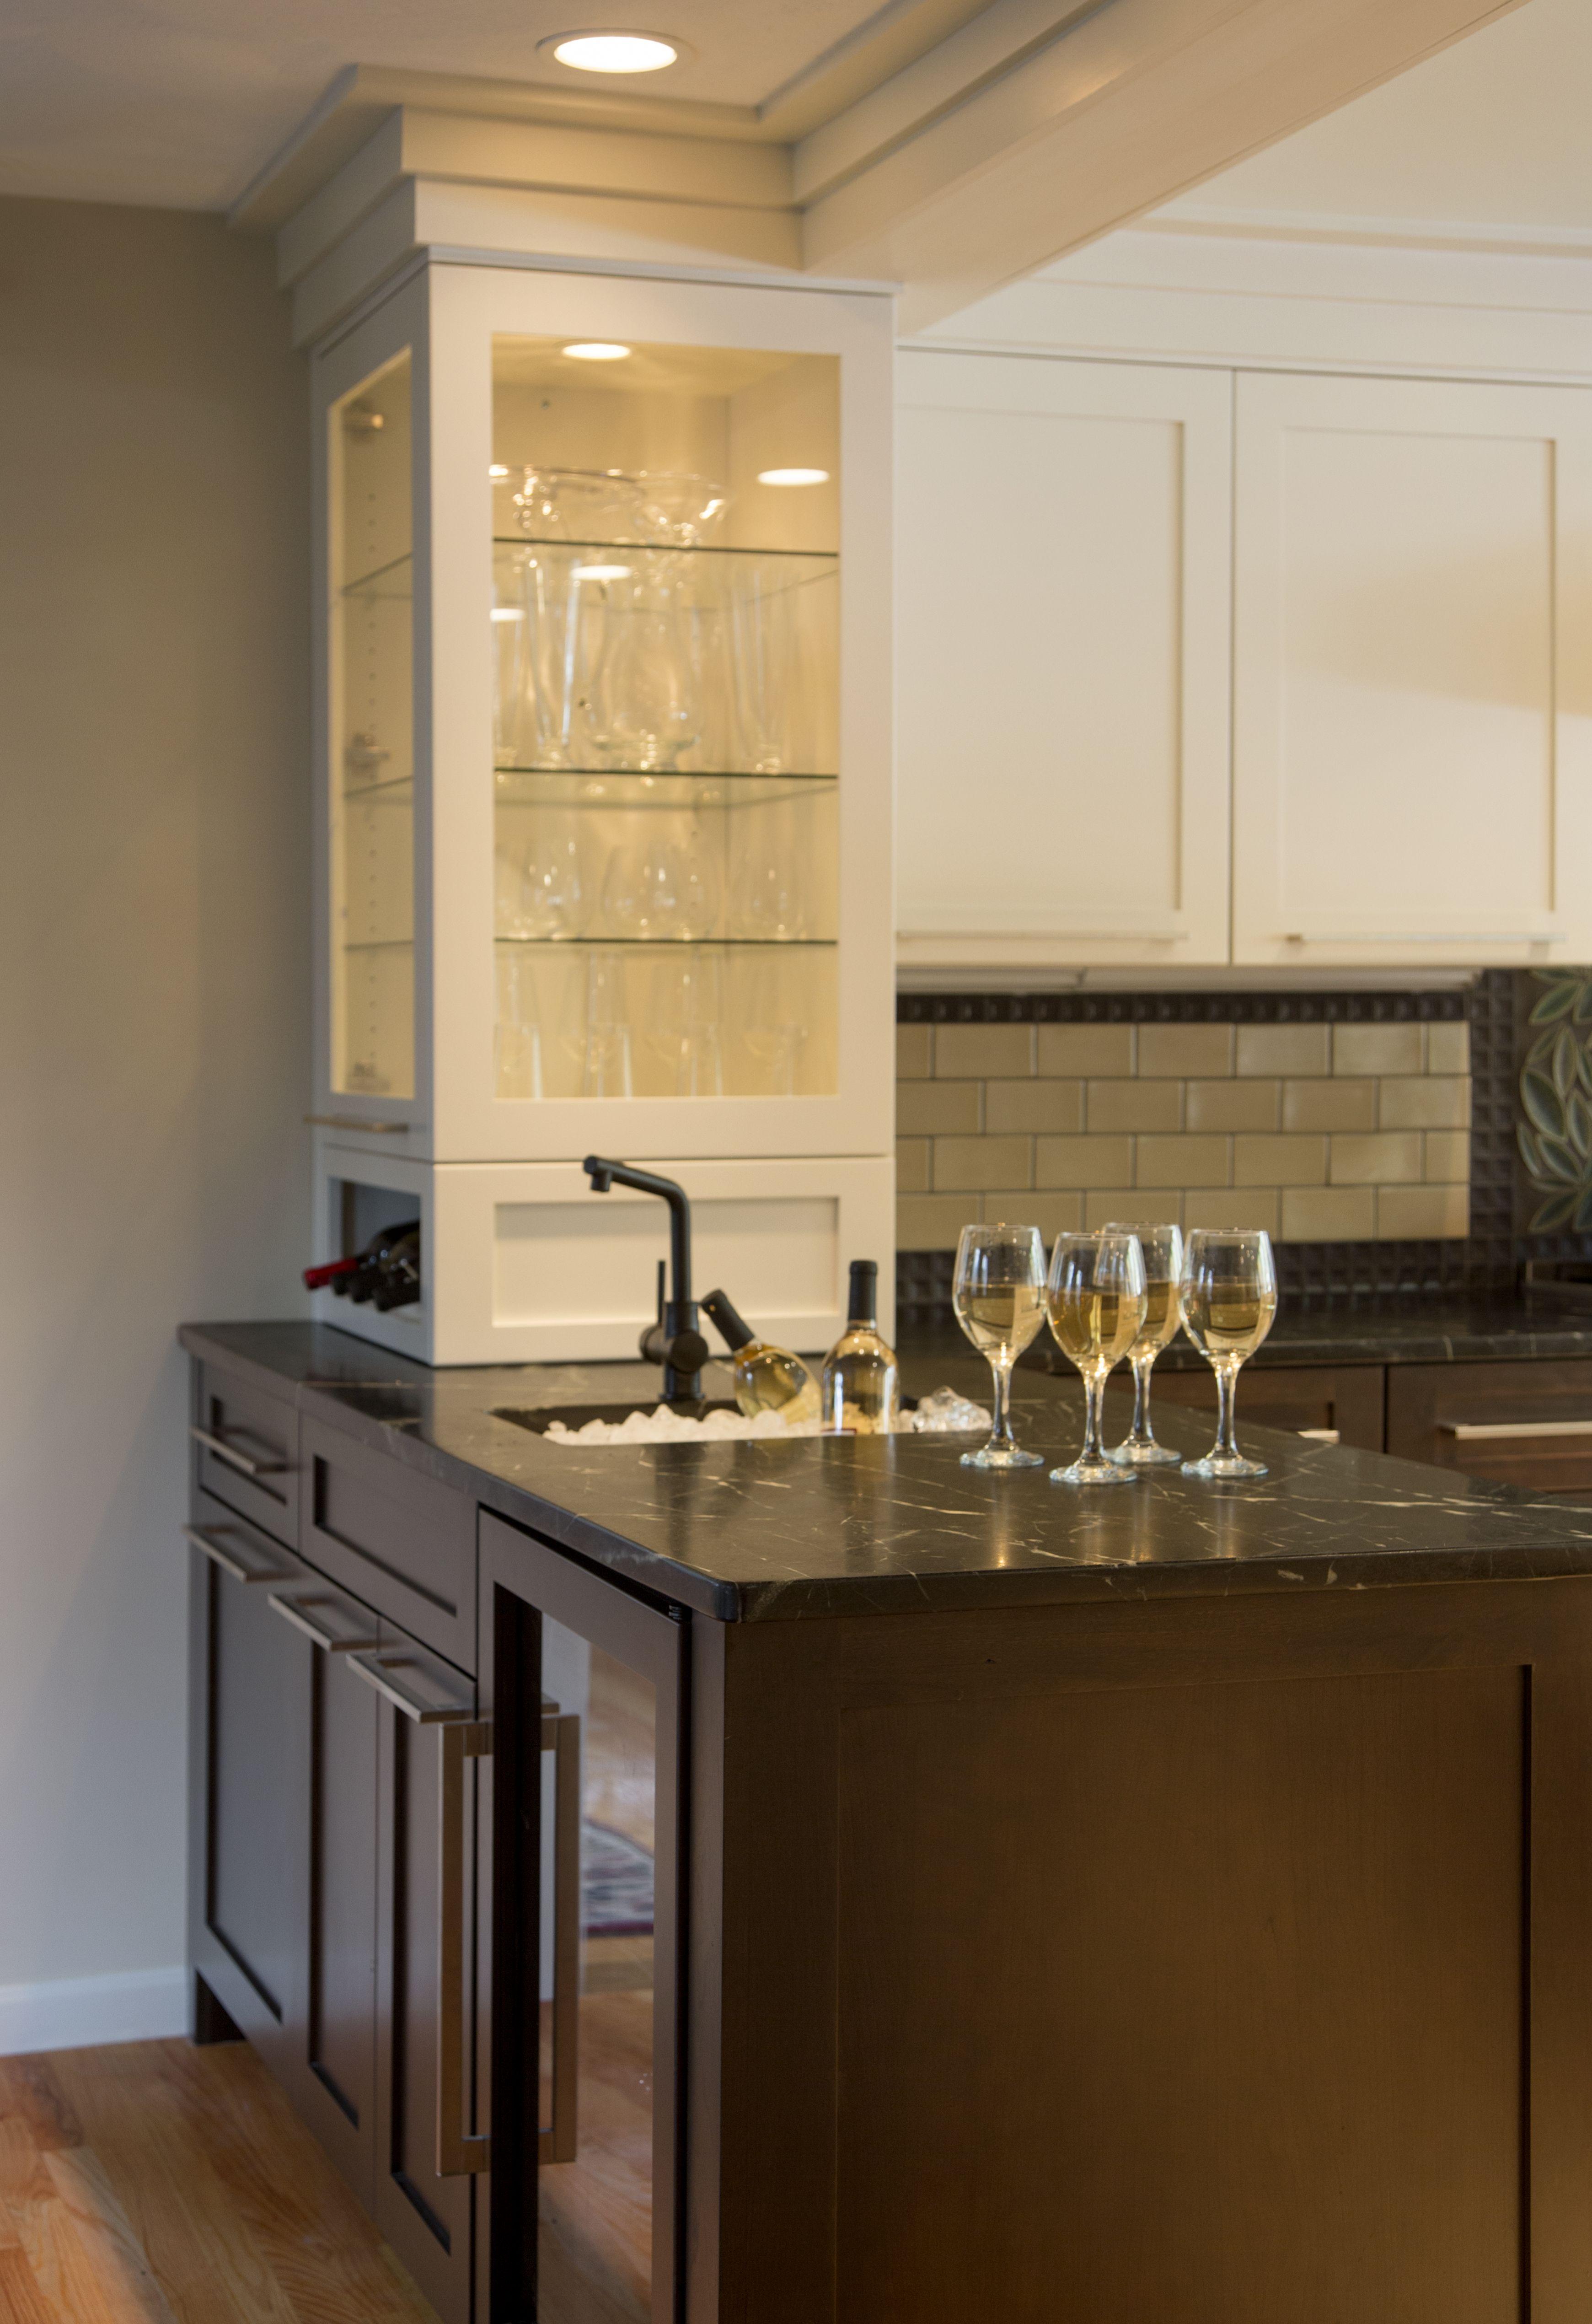 beverage center with bar sink. | beverage centers designed by